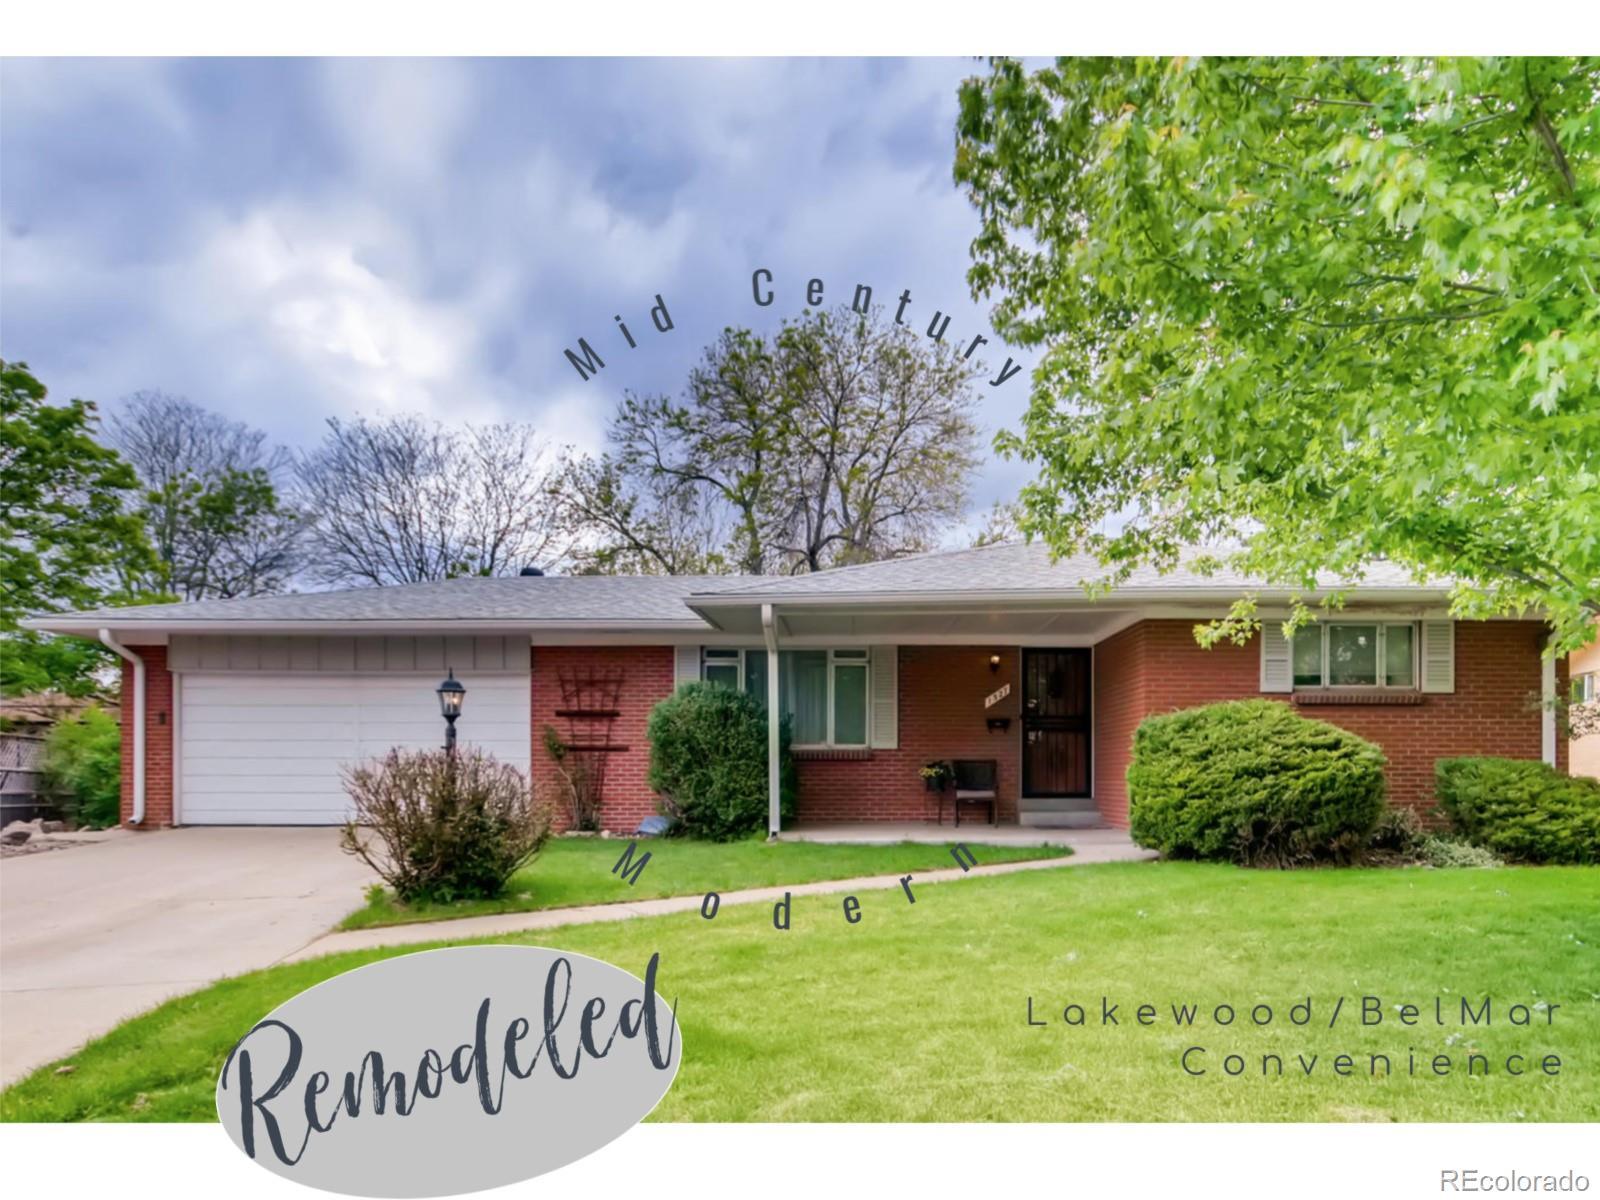 1527 S Ingalls Street, Lakewood, CO 80232 - Lakewood, CO real estate listing